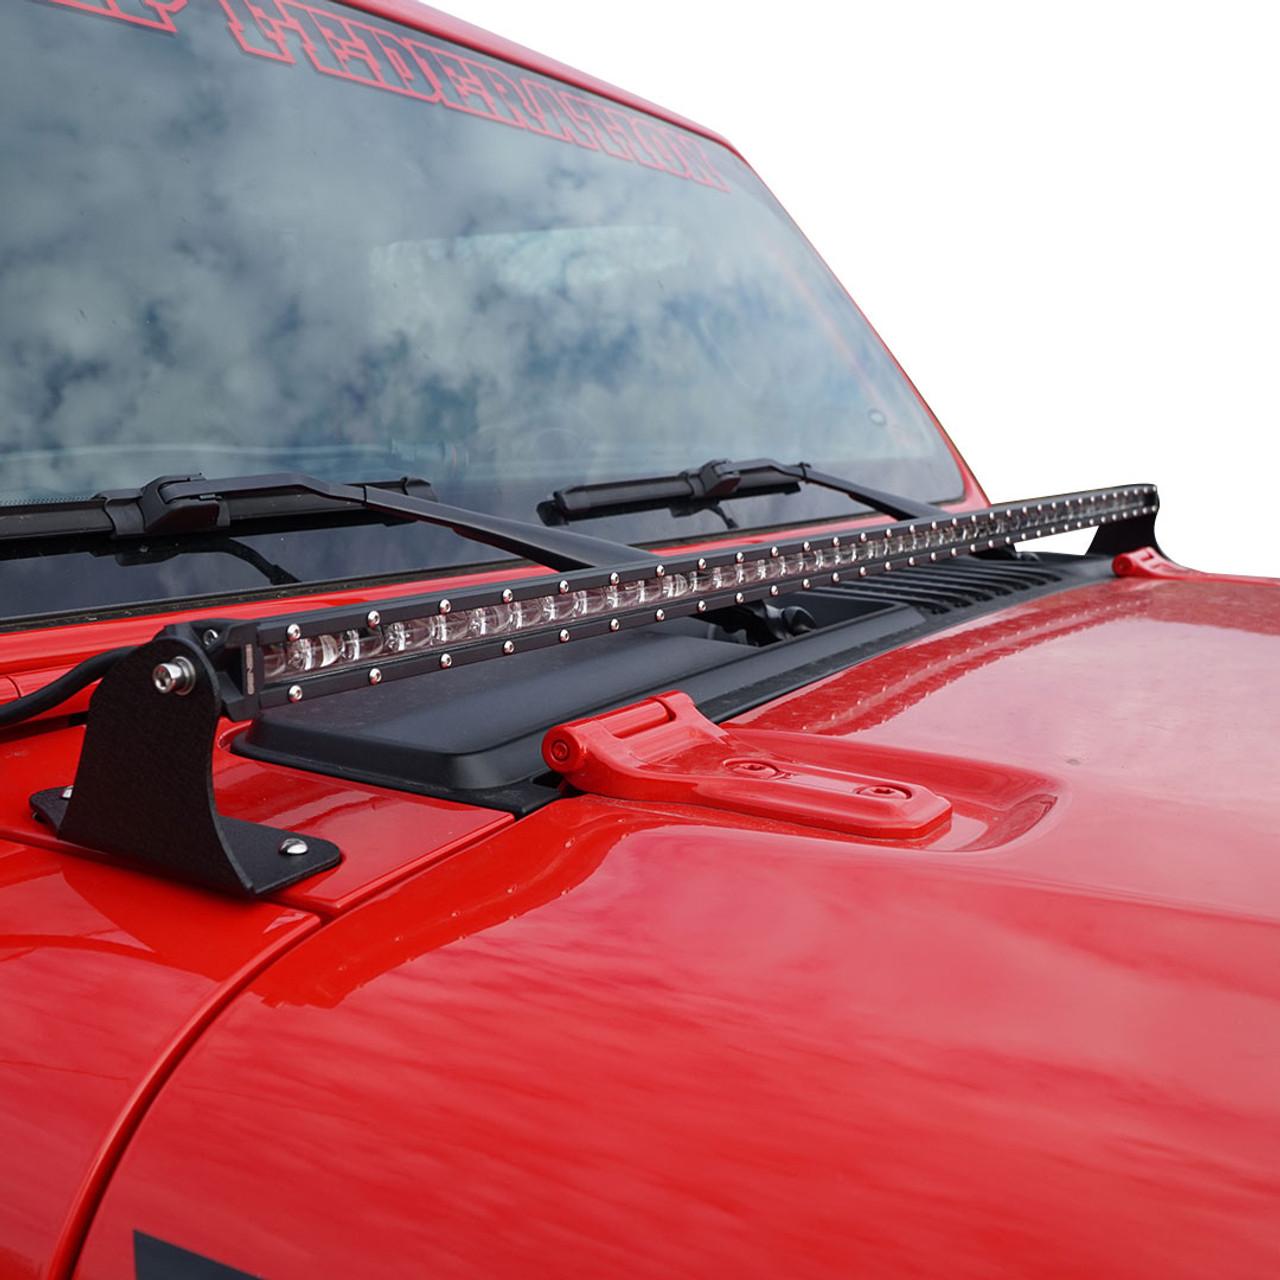 medium resolution of wire harness on jeep jk hood wiring diagrams posts wire harness on jeep jk hood